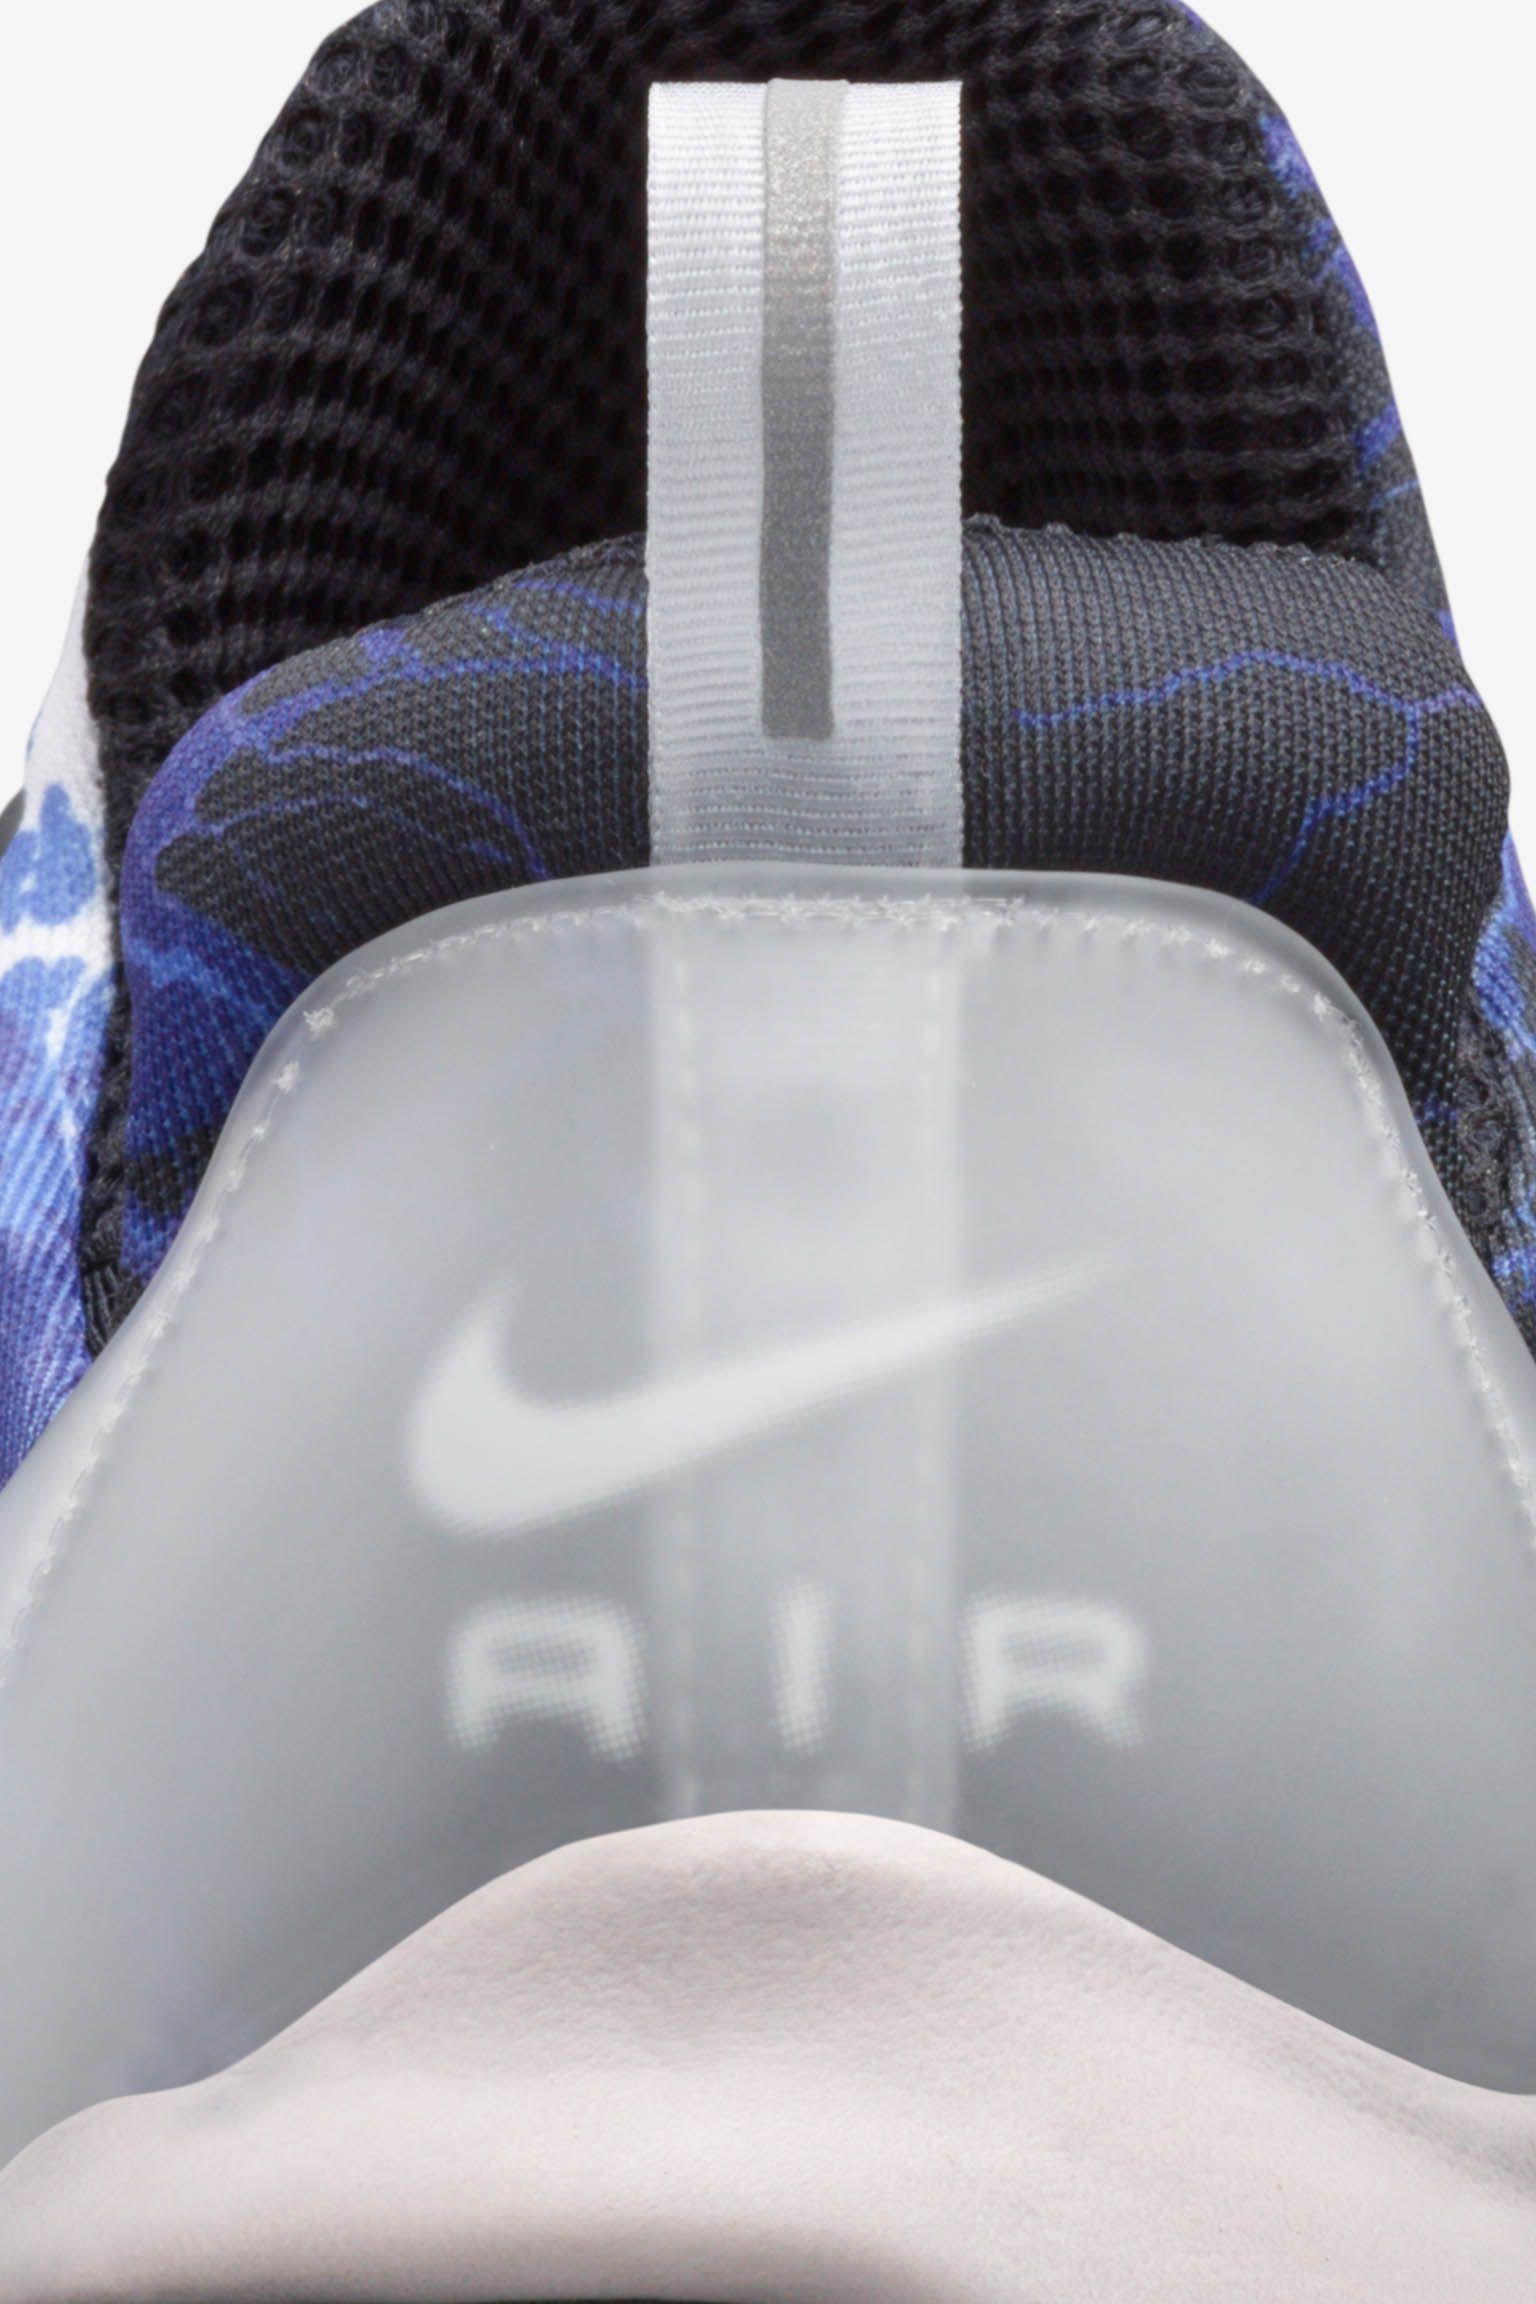 Nike Air Presto 'Lightning' Release Date